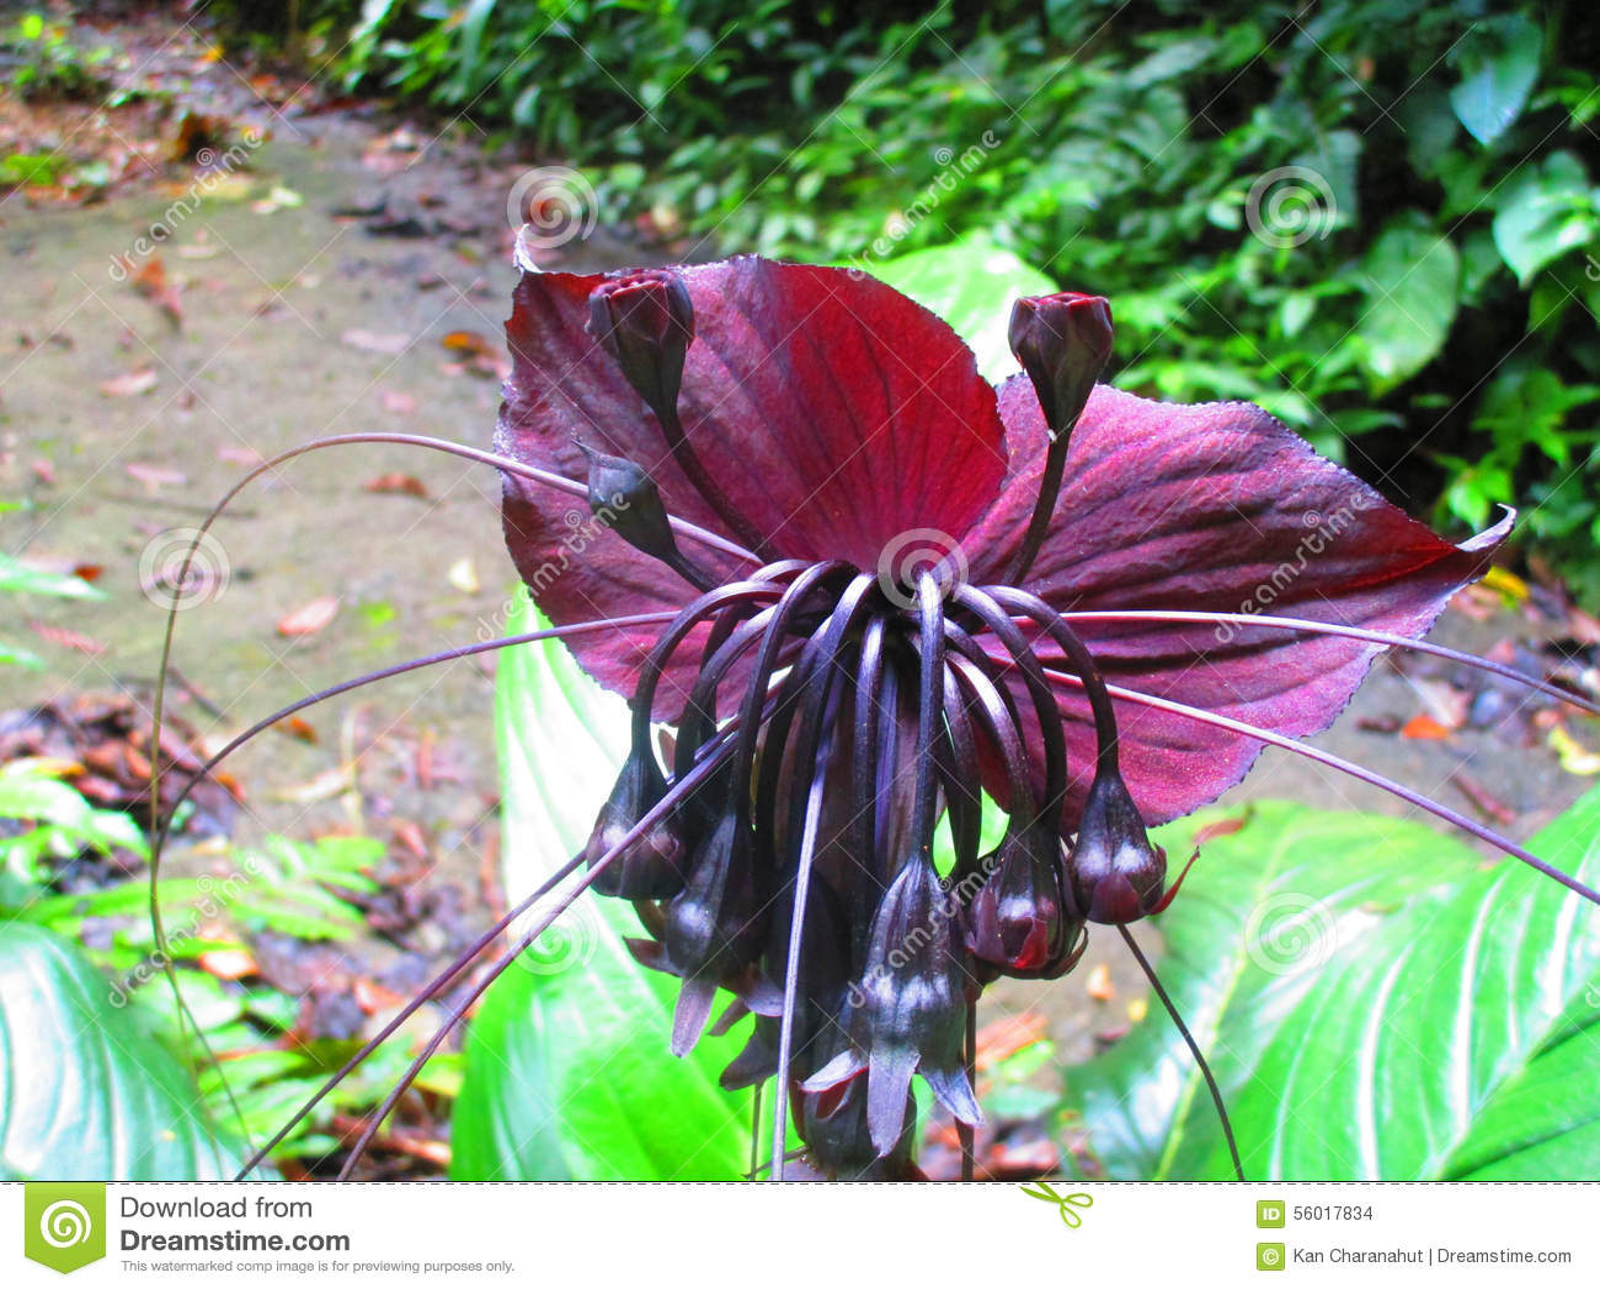 Black Bat Flowers Tacca Chantrieri The Genus Tacca Stock Image 5601